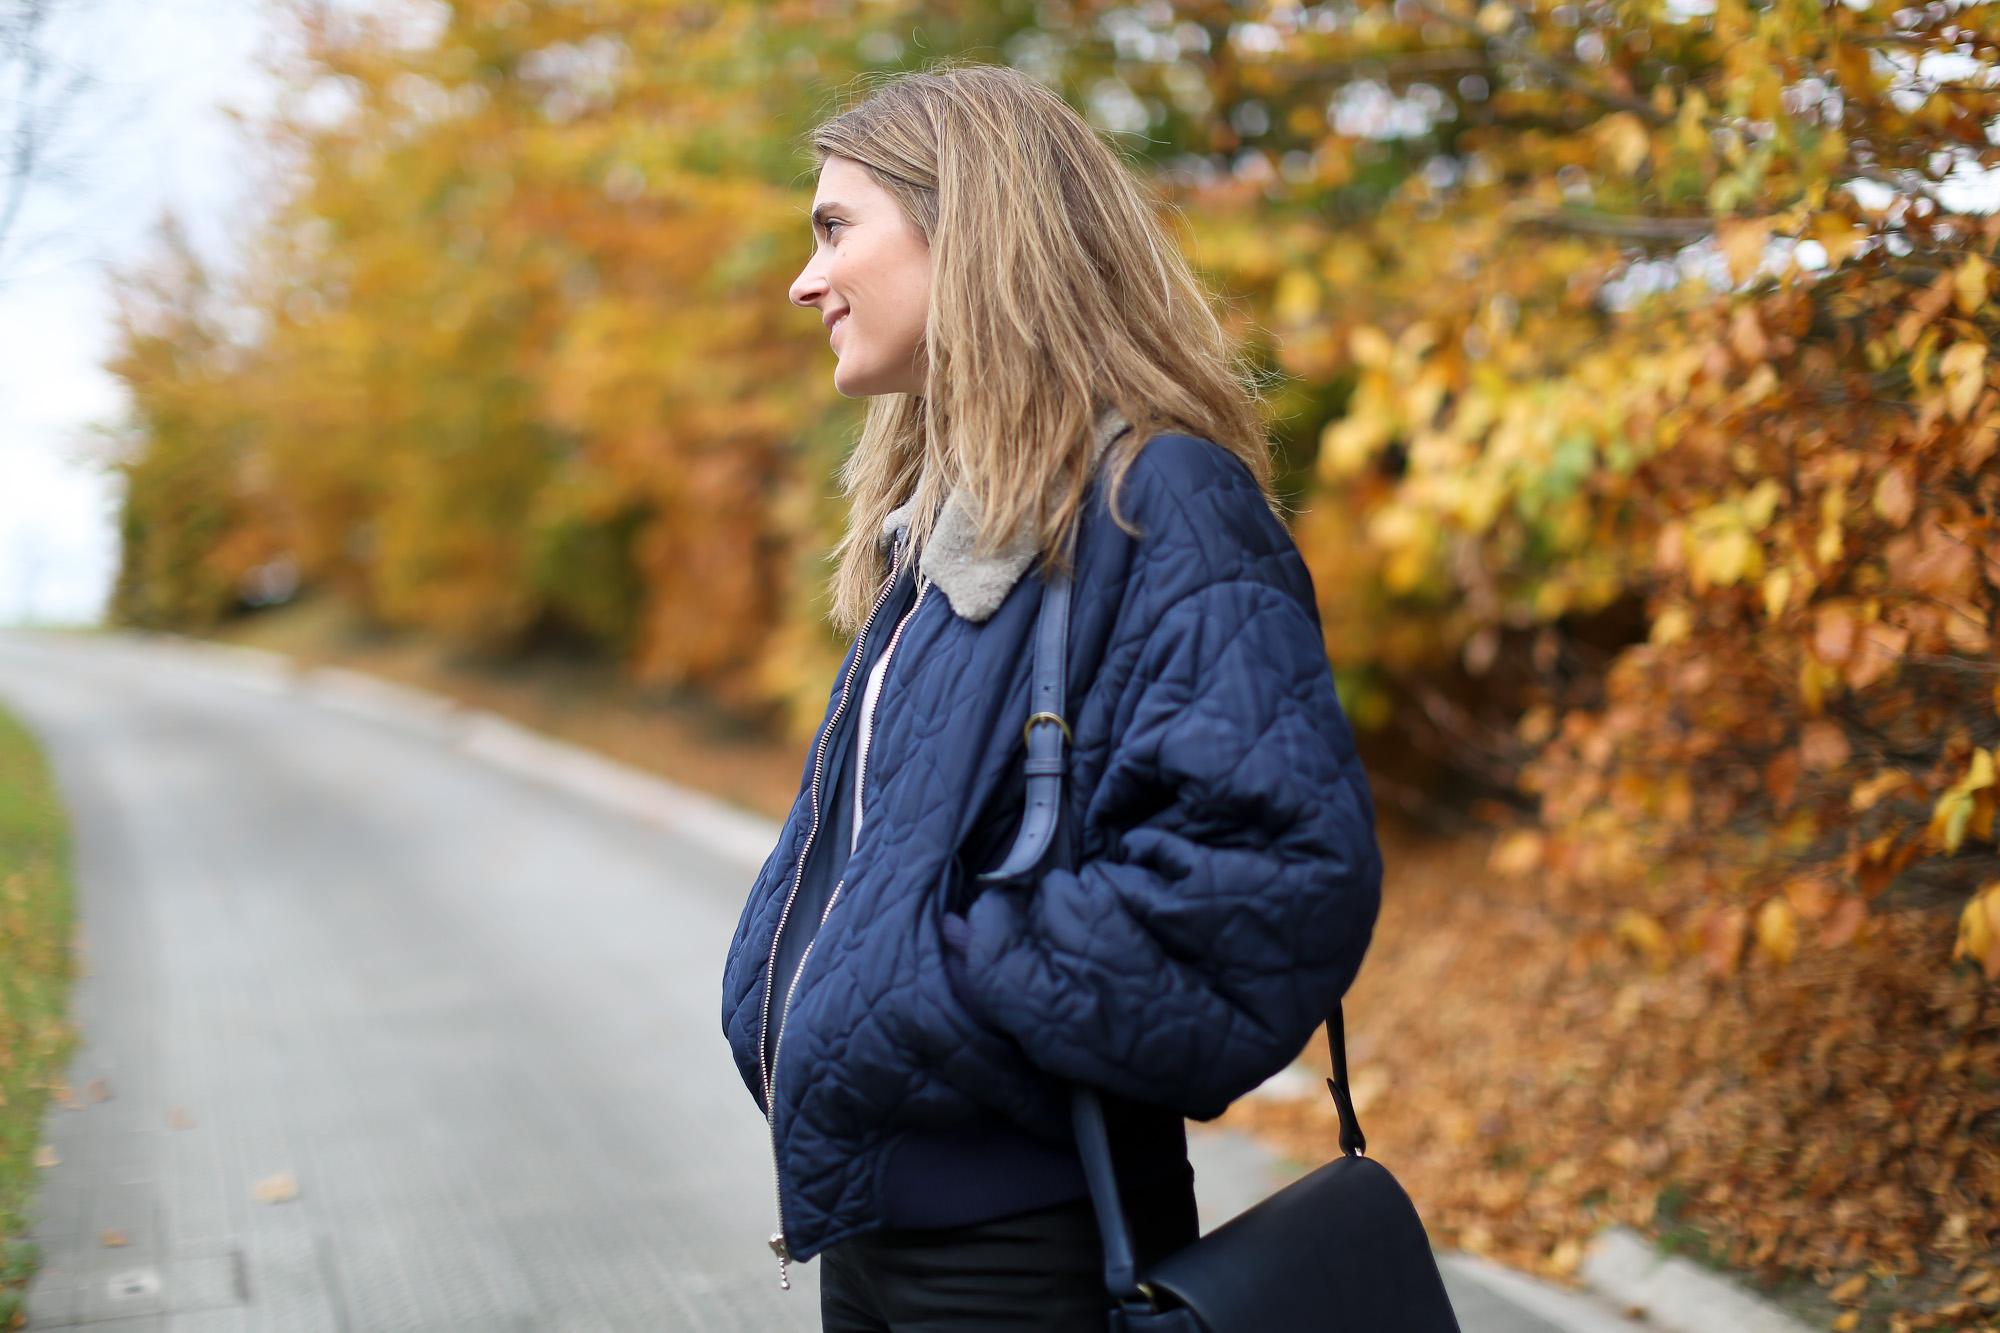 Clochet_streetstyle_stefanel_bomber_jacket_mango_suede_pumps-11